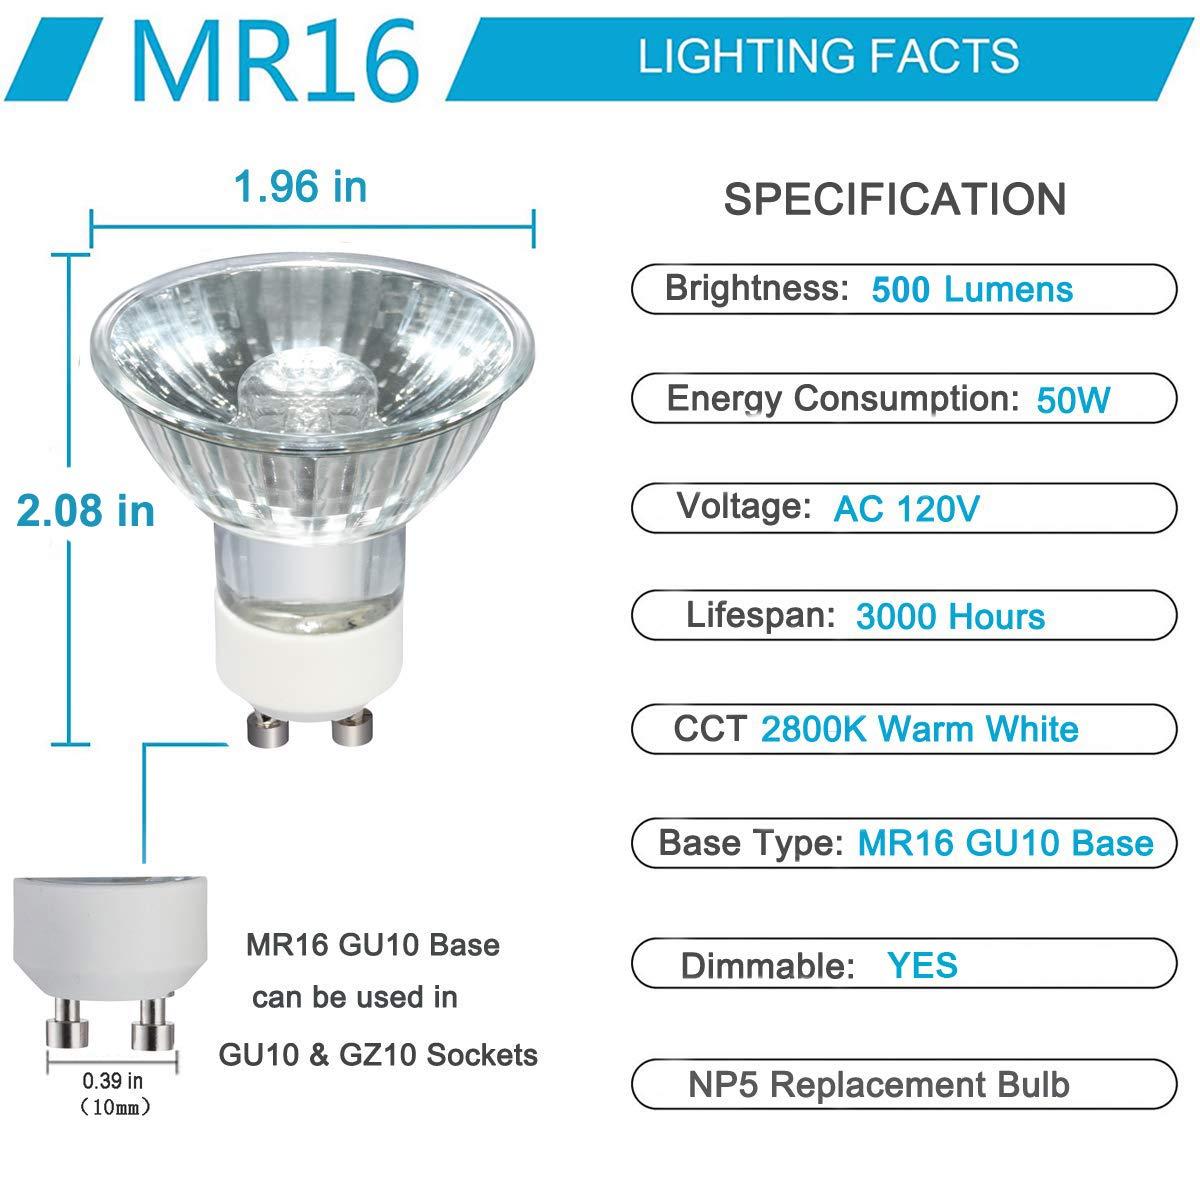 Landscape Lights GU10 Bulb 6pcs GU10 50W Halogen Flood Light Bulbs Tracking Light Nice Warm White MR16 GU10 with Glass Cover for Accent Light Dimmable Long Lasting Lifetime GU10 Base